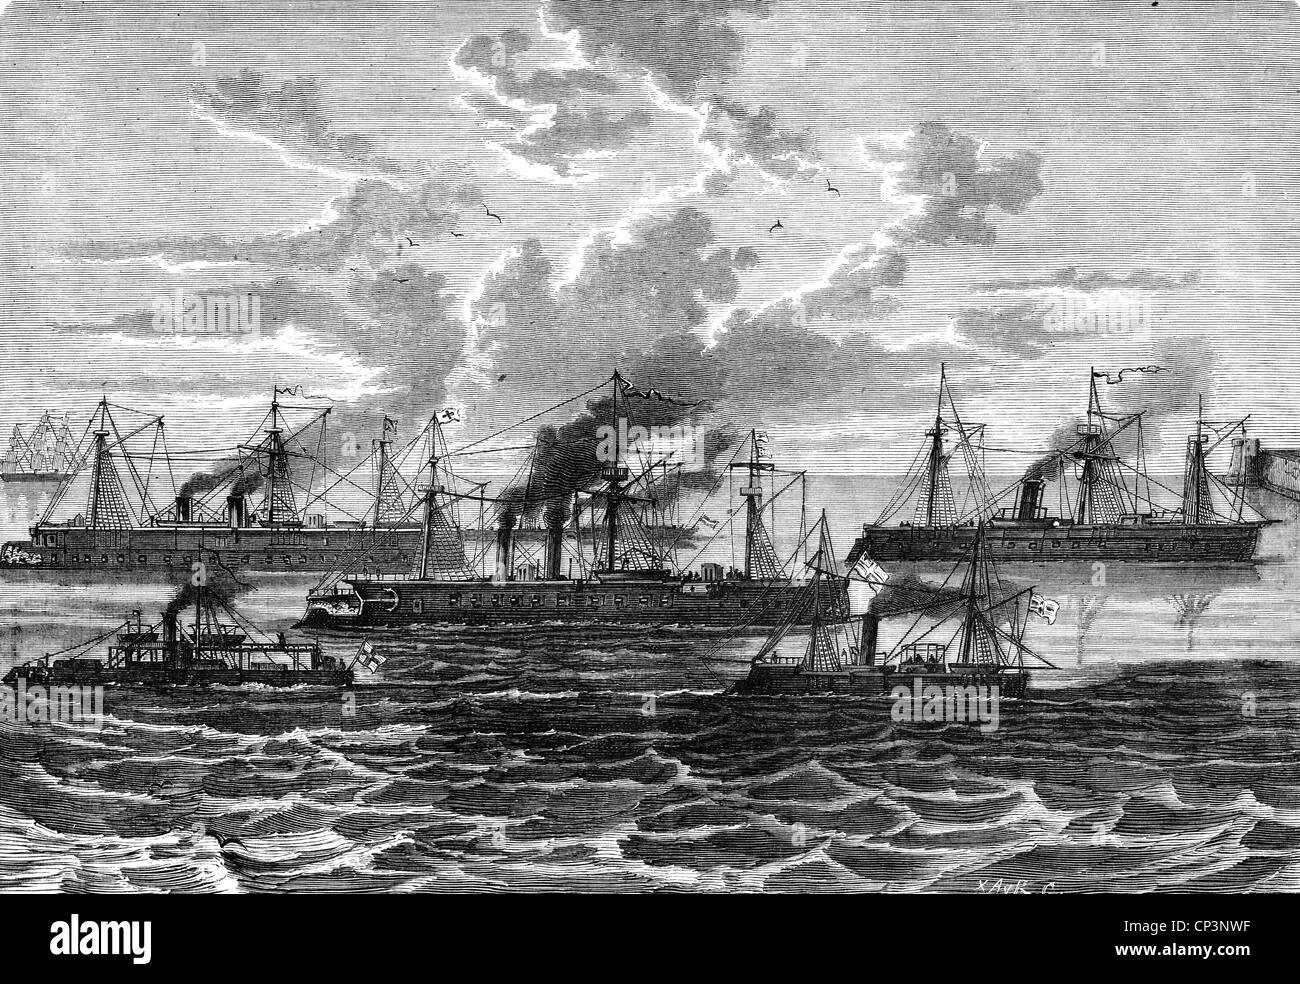 Eventi, guerra franco-prussiana 1870 - 1871, guerra navale, flotta tedesca di ironglad a Wilhelmshaven, ironglad Foto Stock